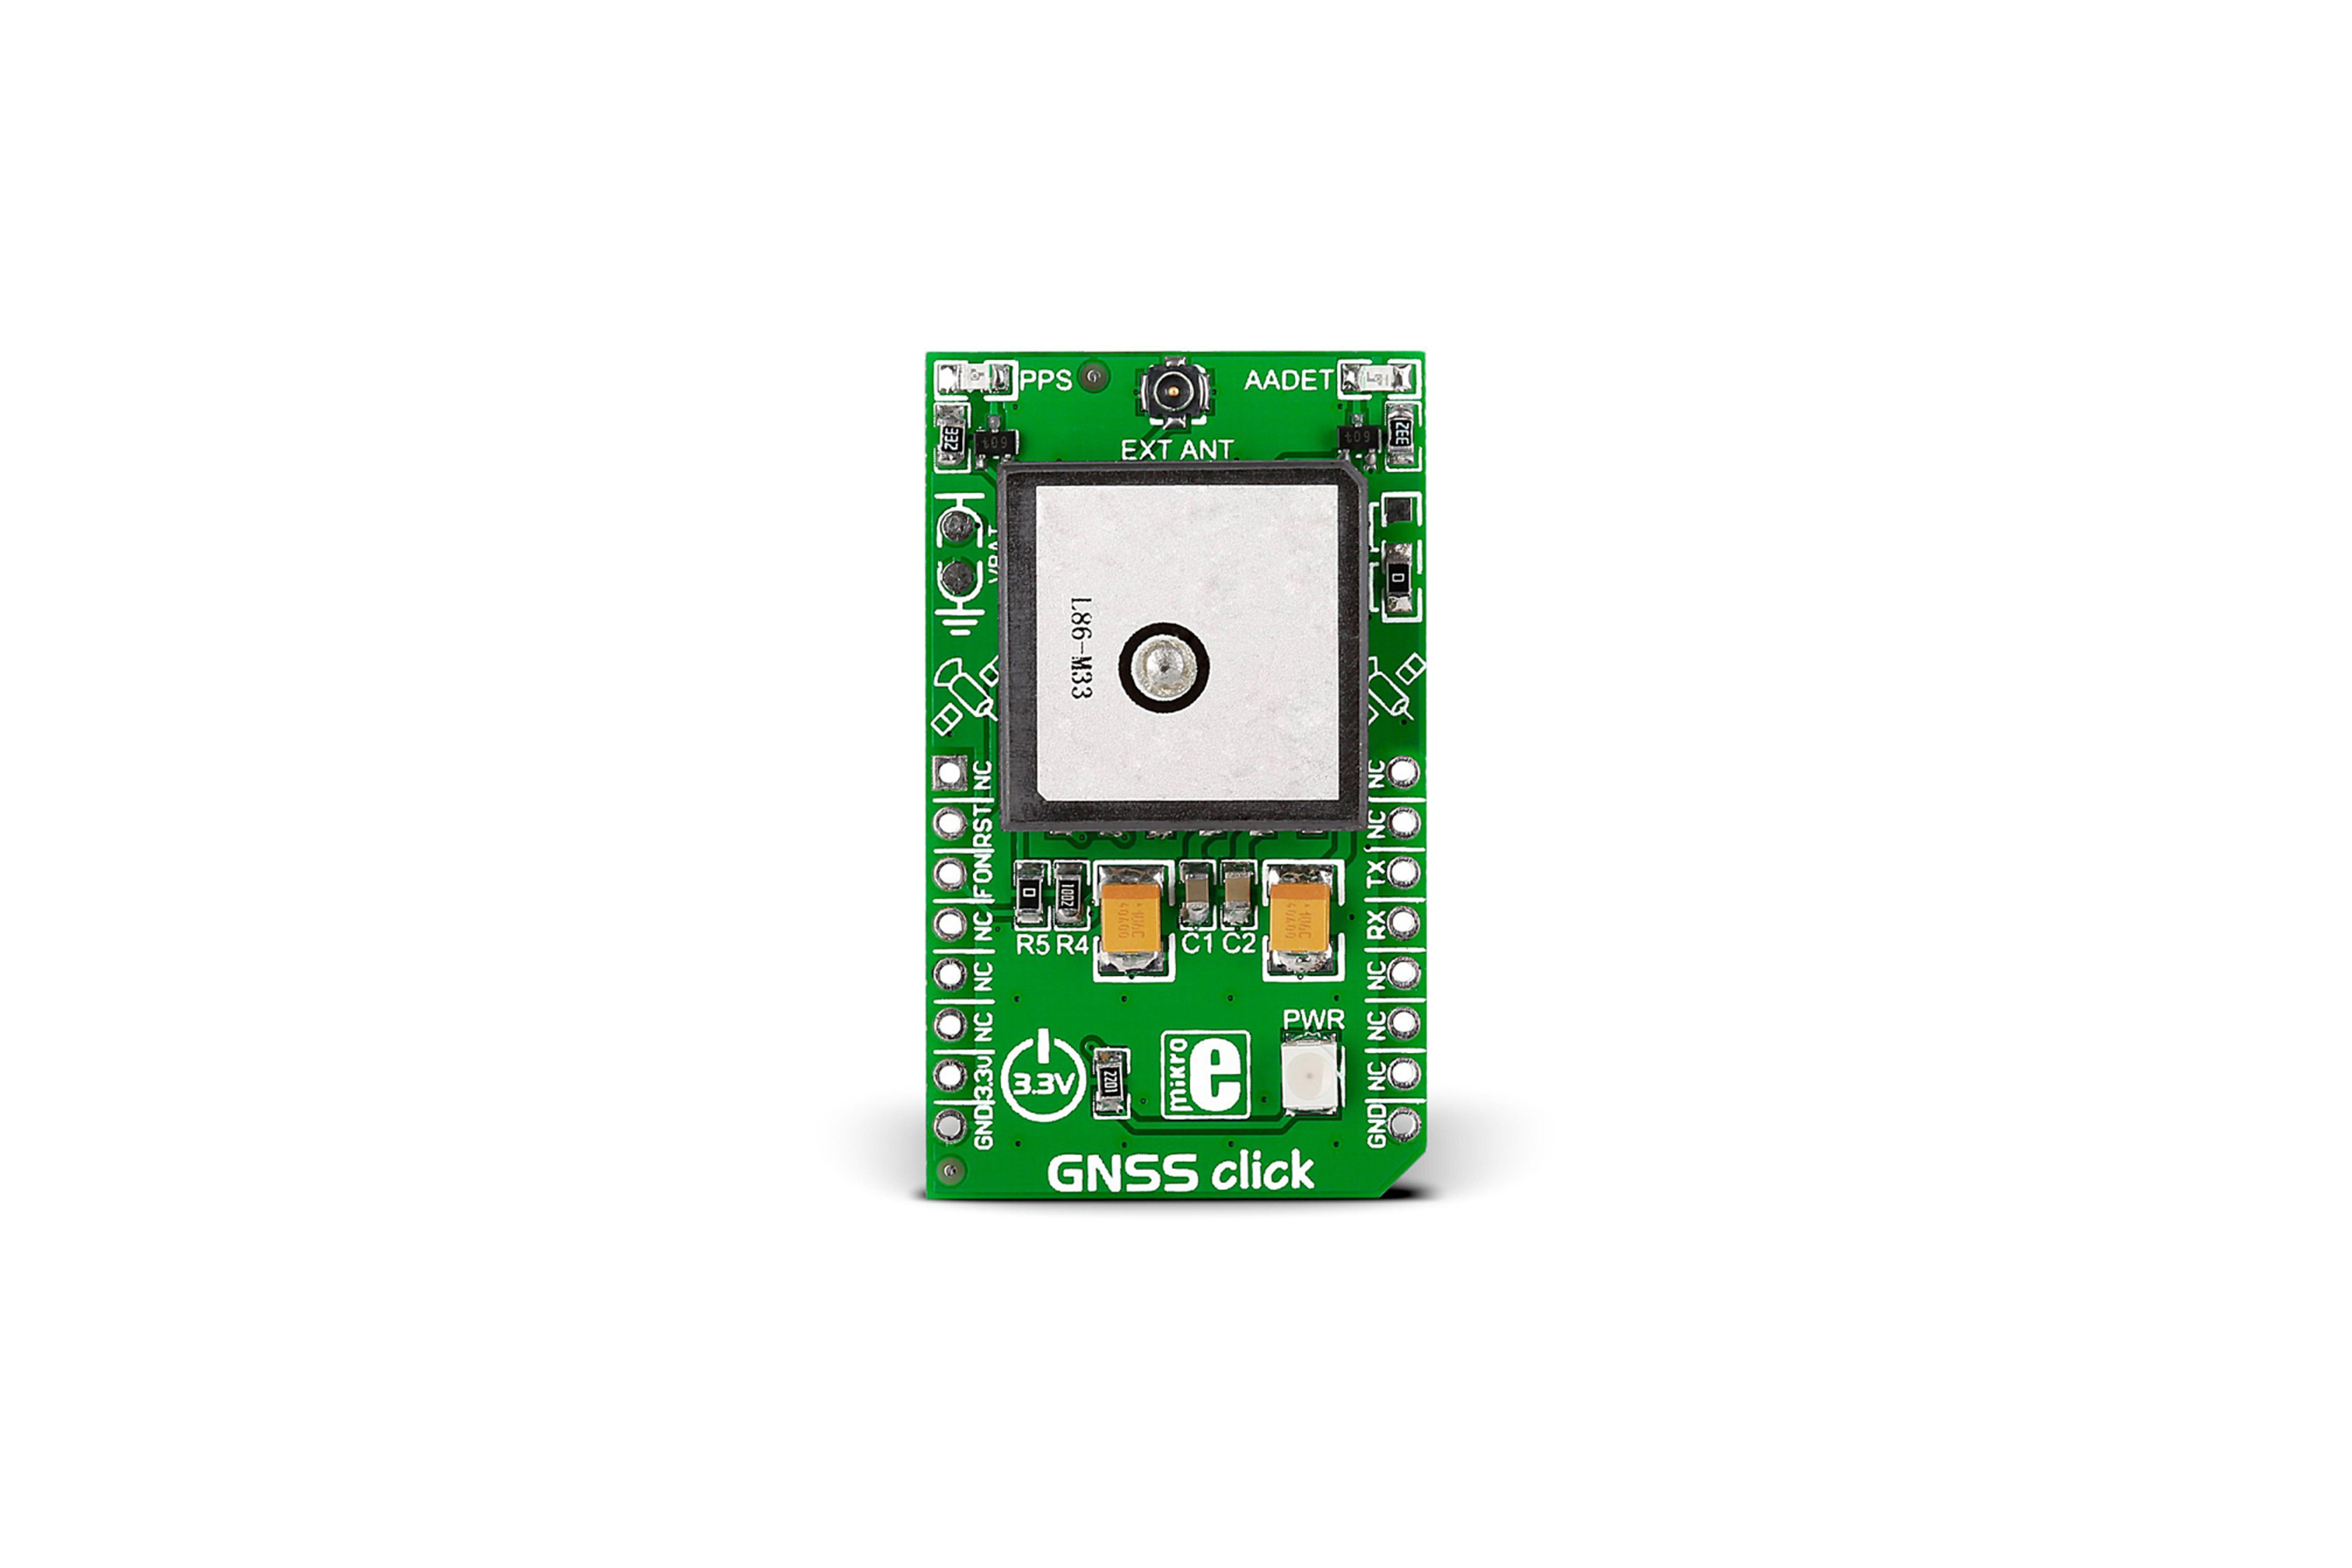 CARTE DE POSITIONNEMENT GNSSÀ CLIC GPS/GLONASS